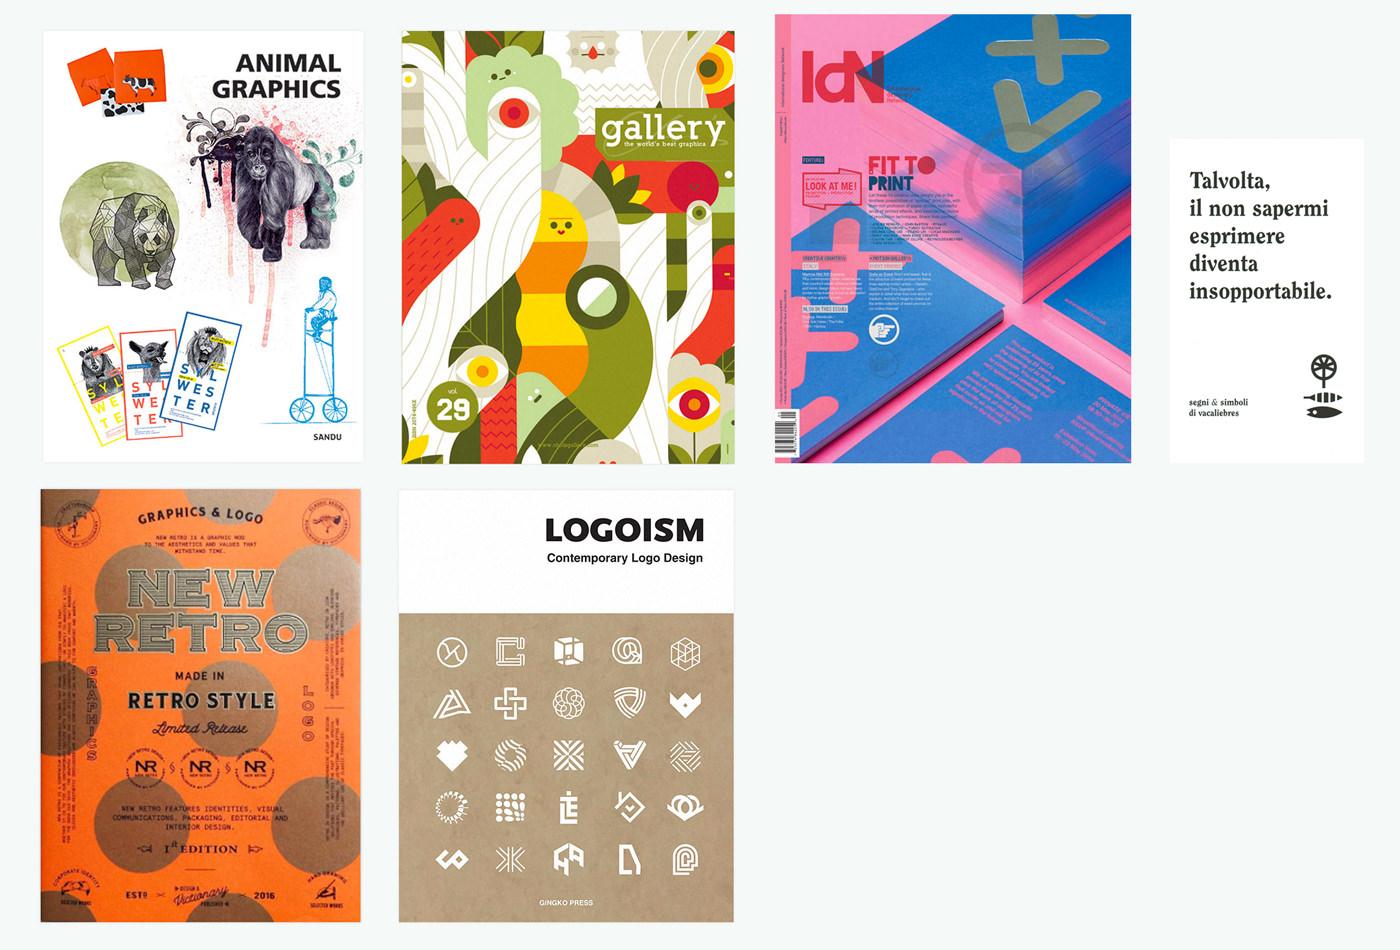 vacaliebres-book-animal-graphics-sandu-sandupublishing-victionary-idn-magazine-newretro-logoism